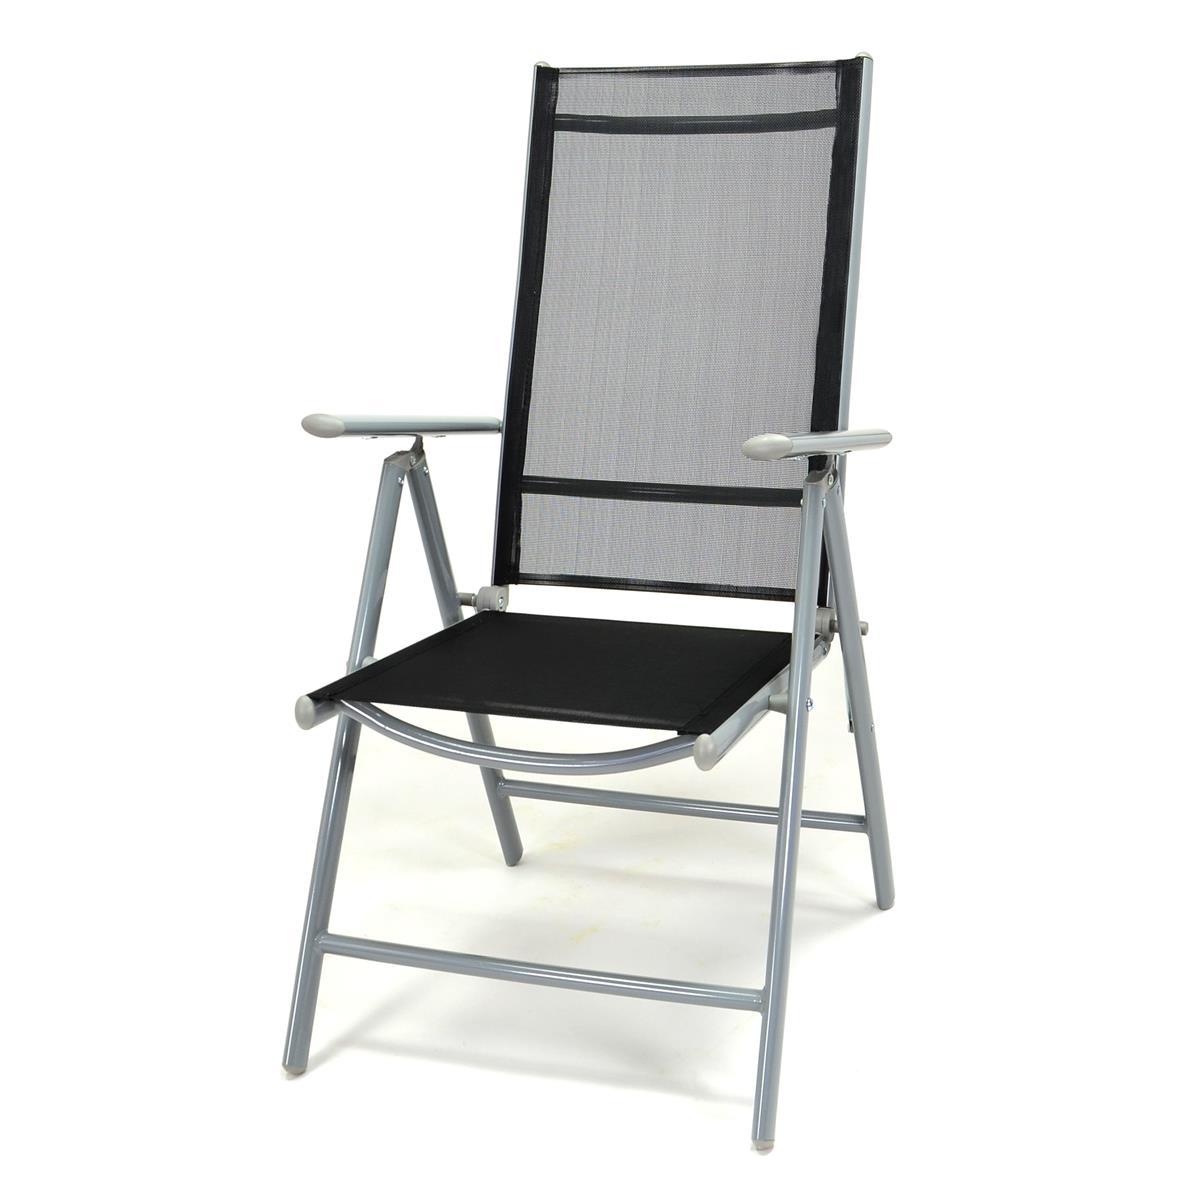 Klappstuhl Aluminium Komfortbreite Gartenstuhl Textilene schwarz Rahmen grau